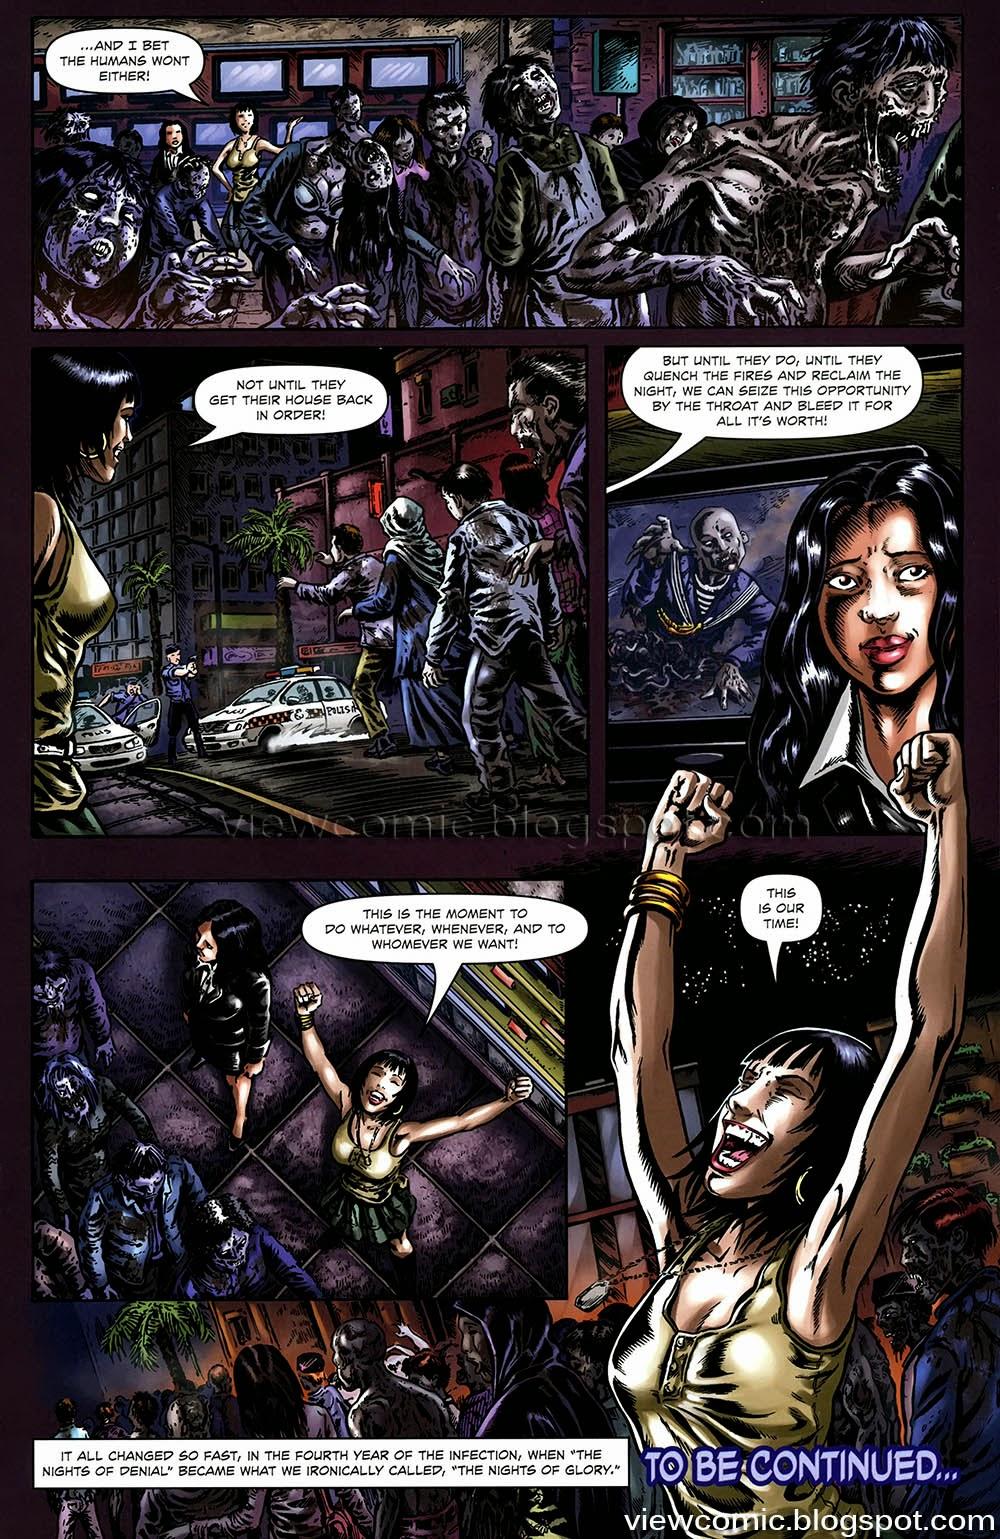 Extinction Parade Pics, Comics Collection